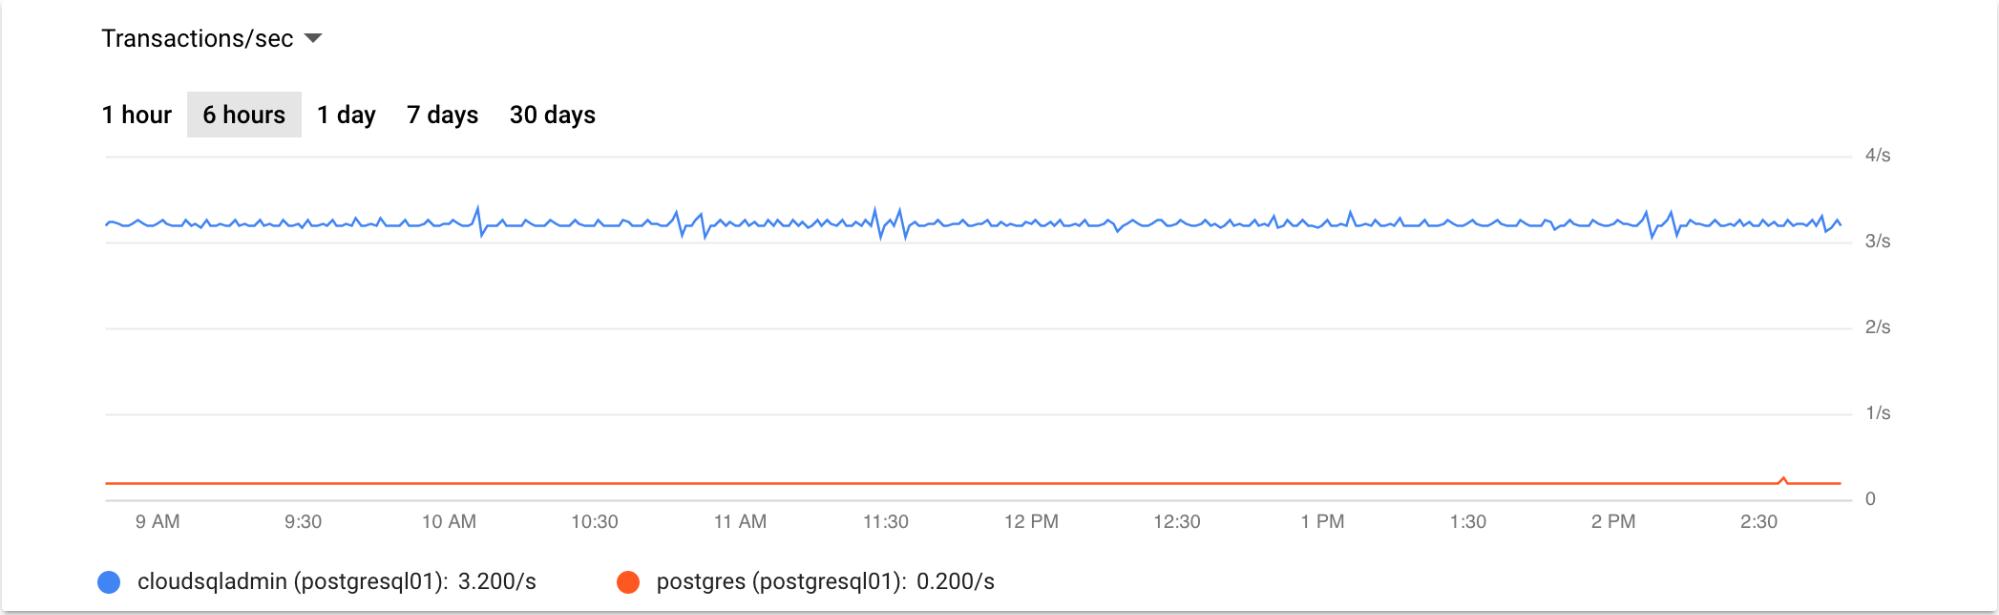 Grafik der Transaktionen pro Sekunde in den letzten 6Stunden.